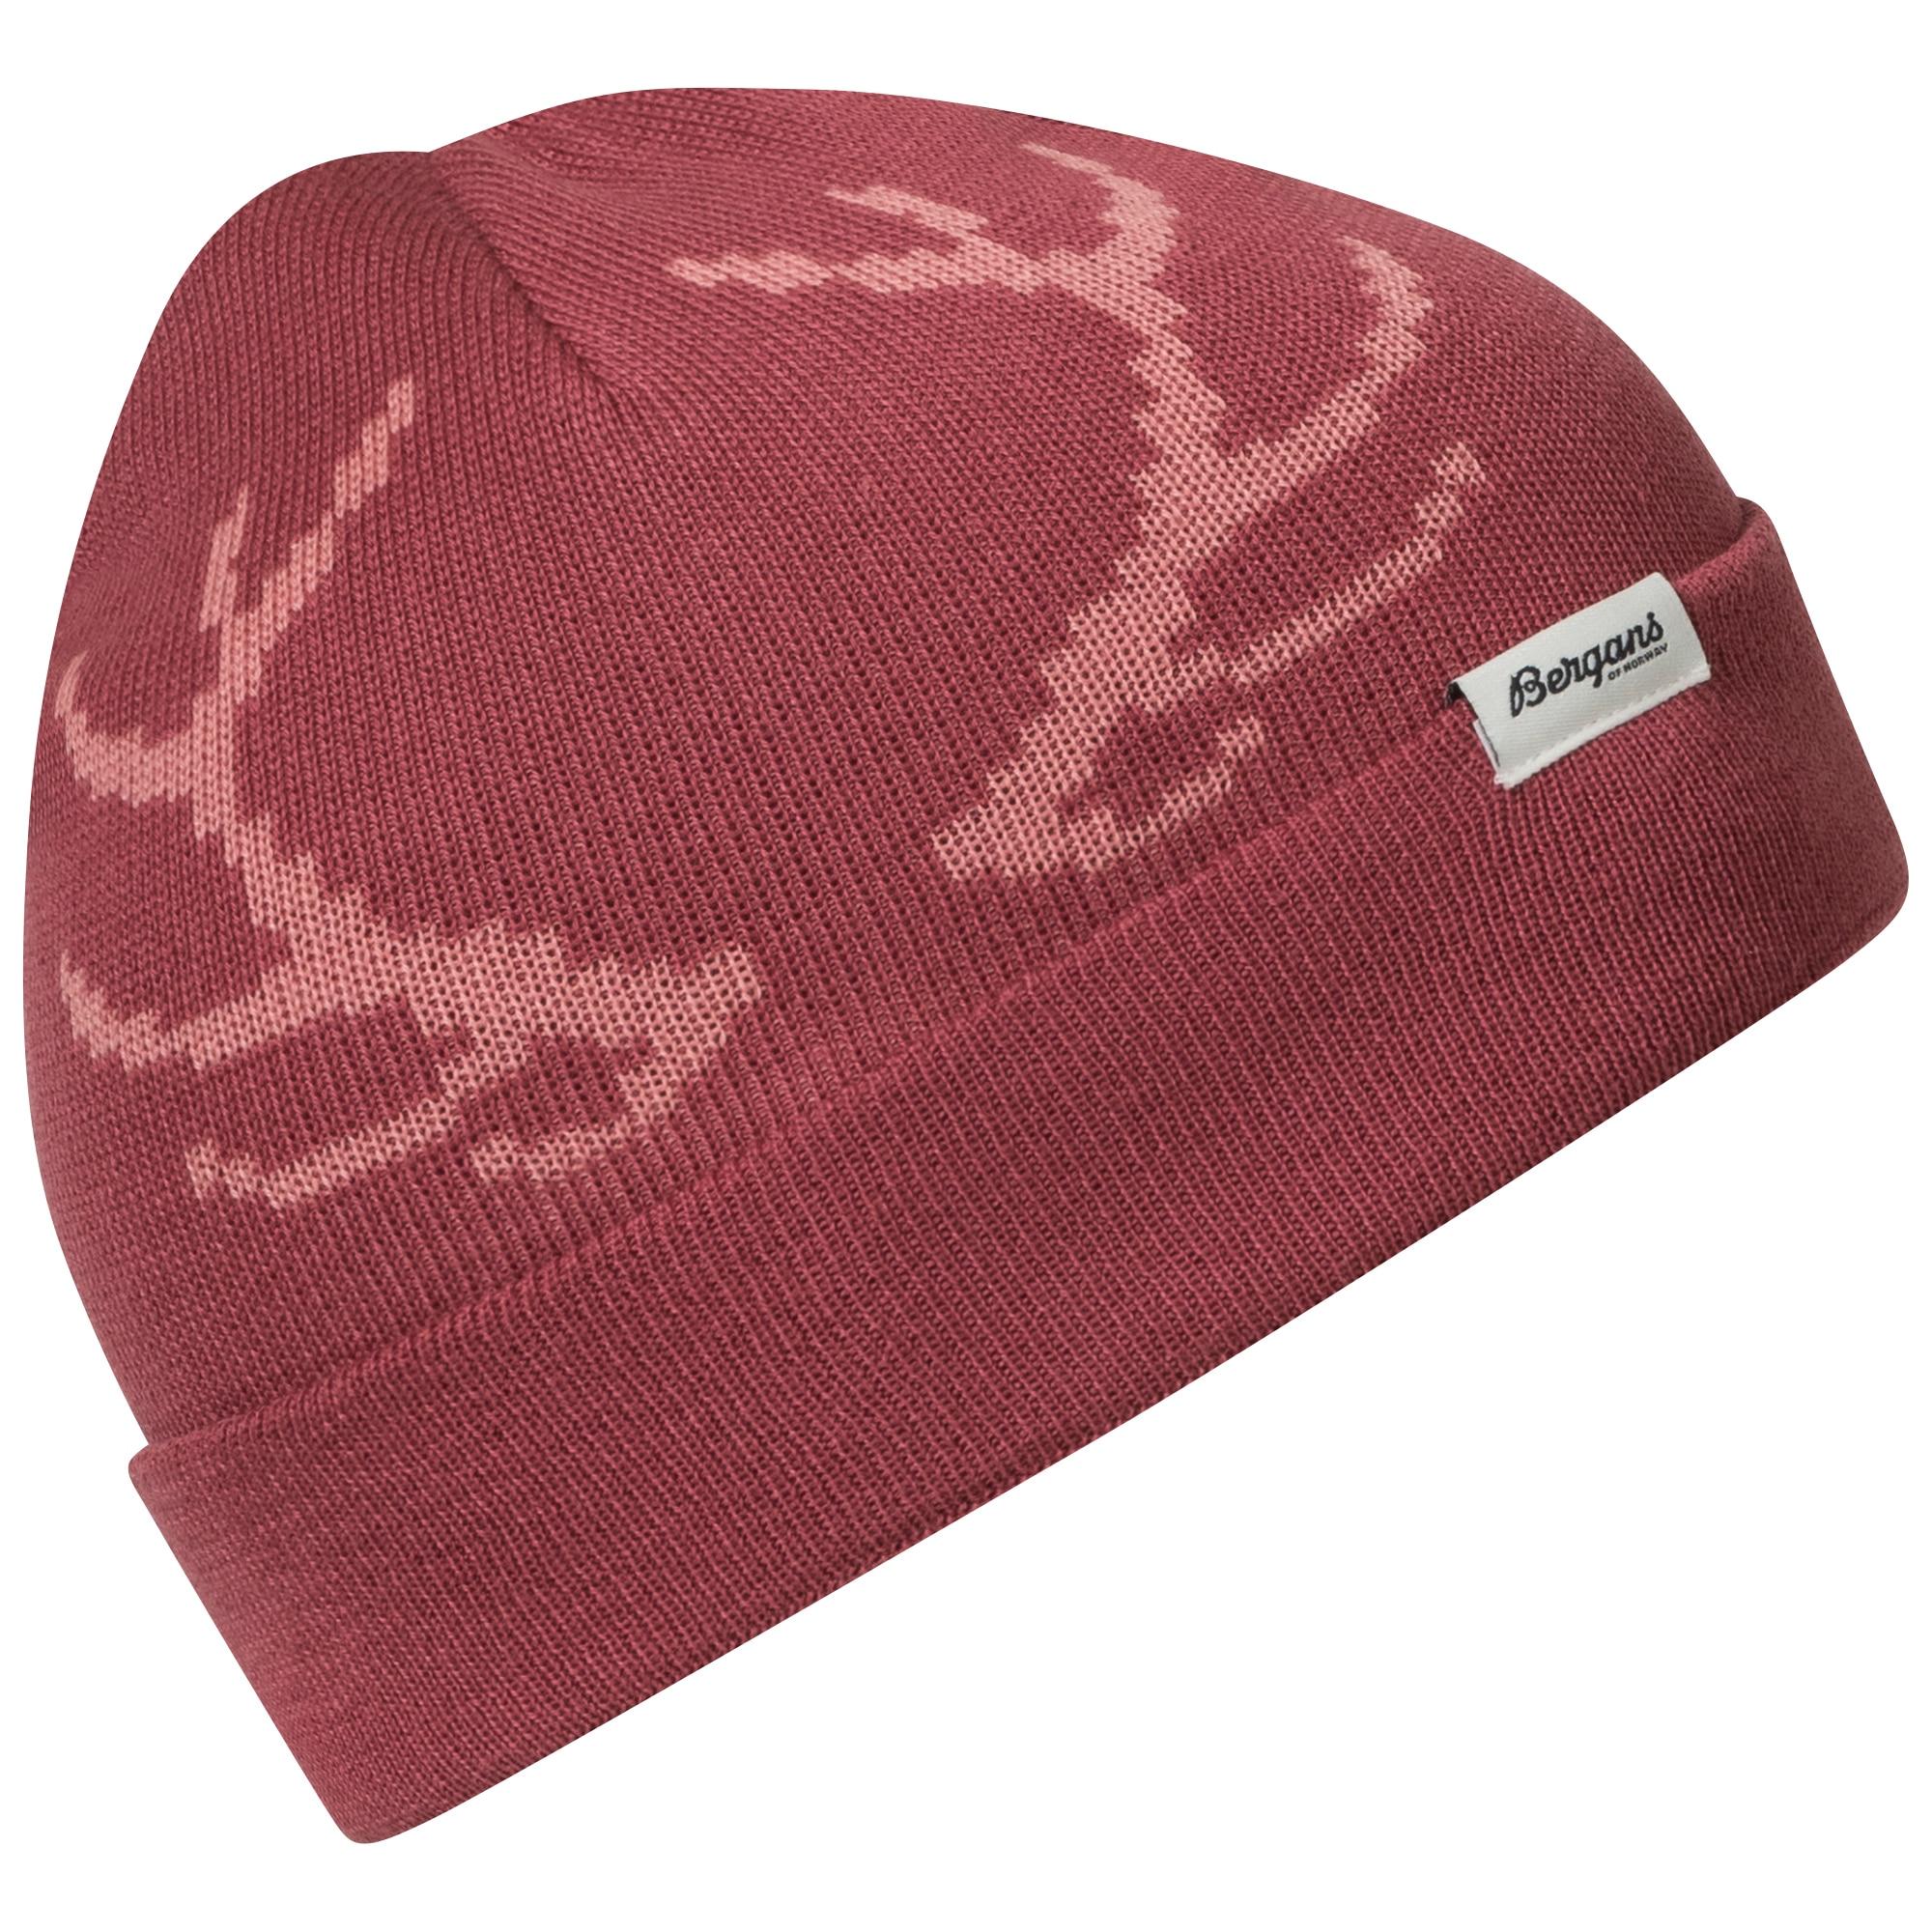 Antlers Kids Beanie